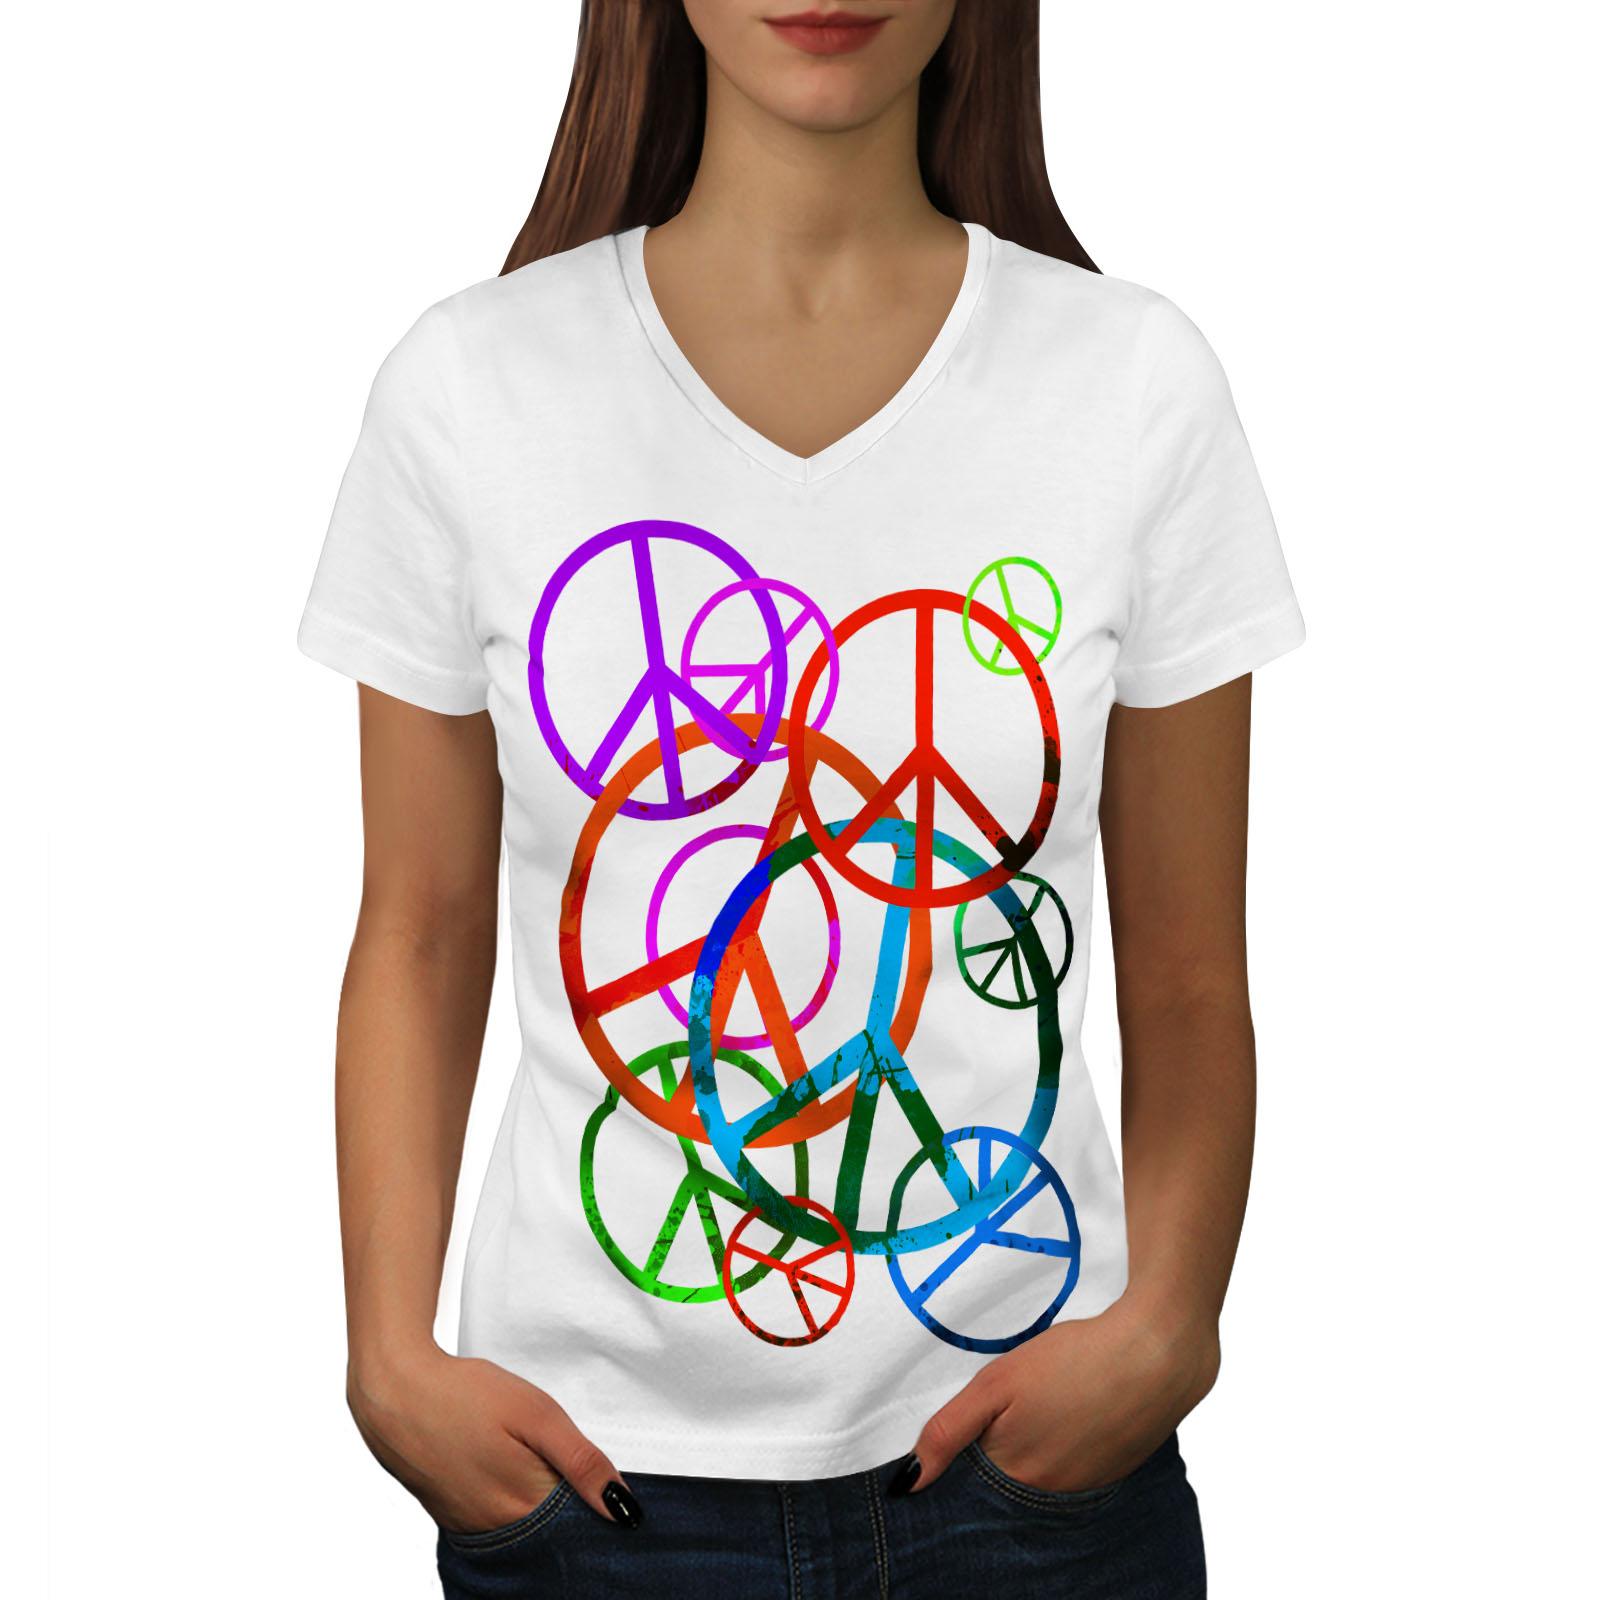 Wellcoda-solo-amore-e-Peace-Da-Donna-V-Neck-T-shirt-Hippie-Graphic-Design-Tee miniatura 7